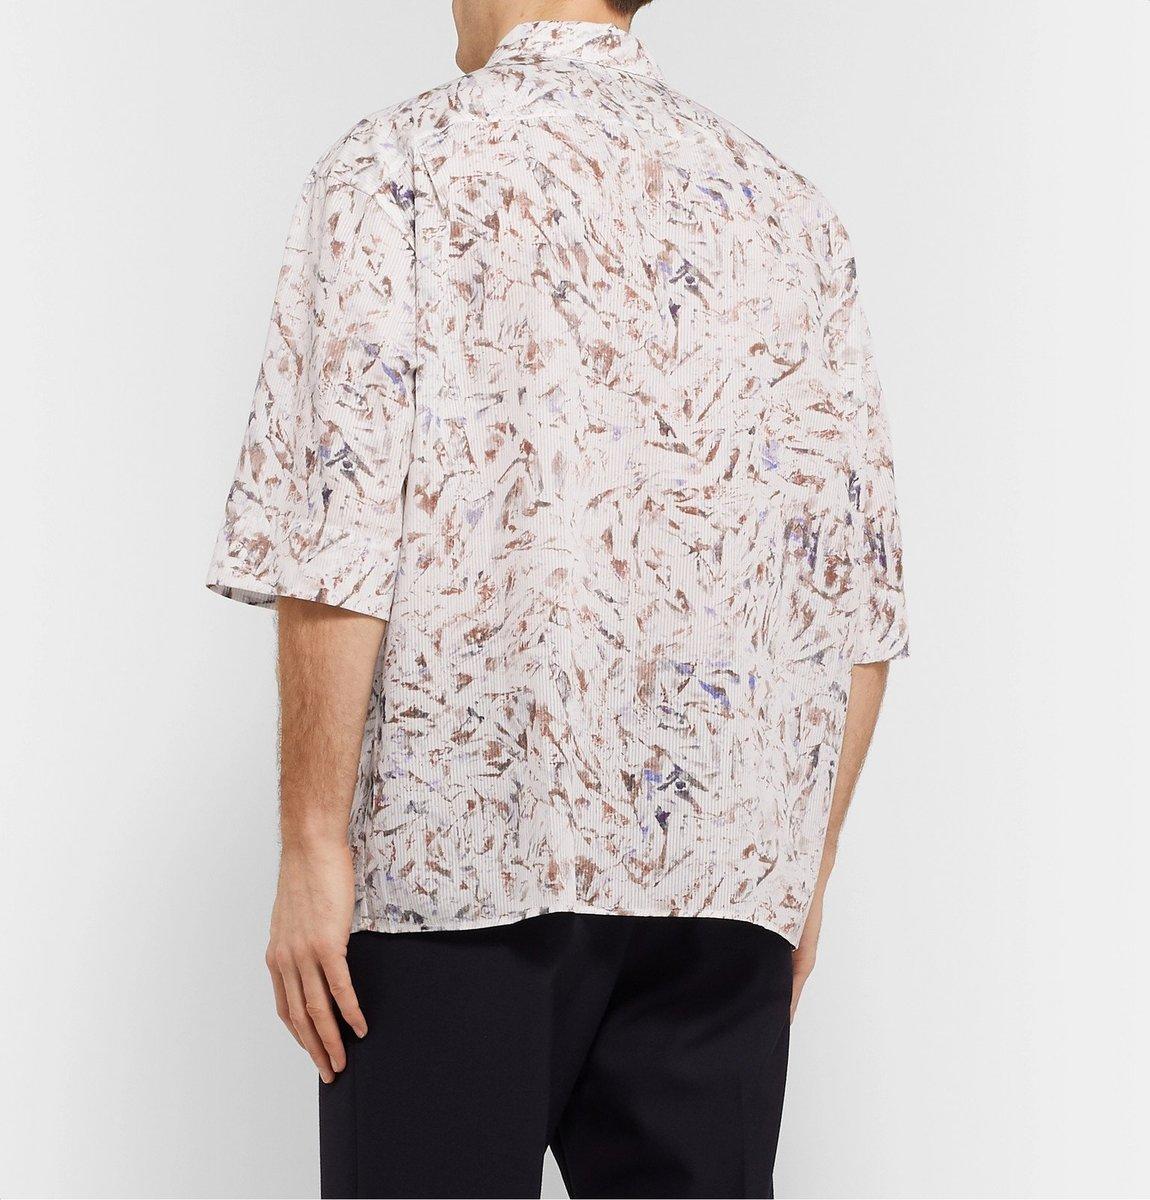 Lemaire shirt.jpg